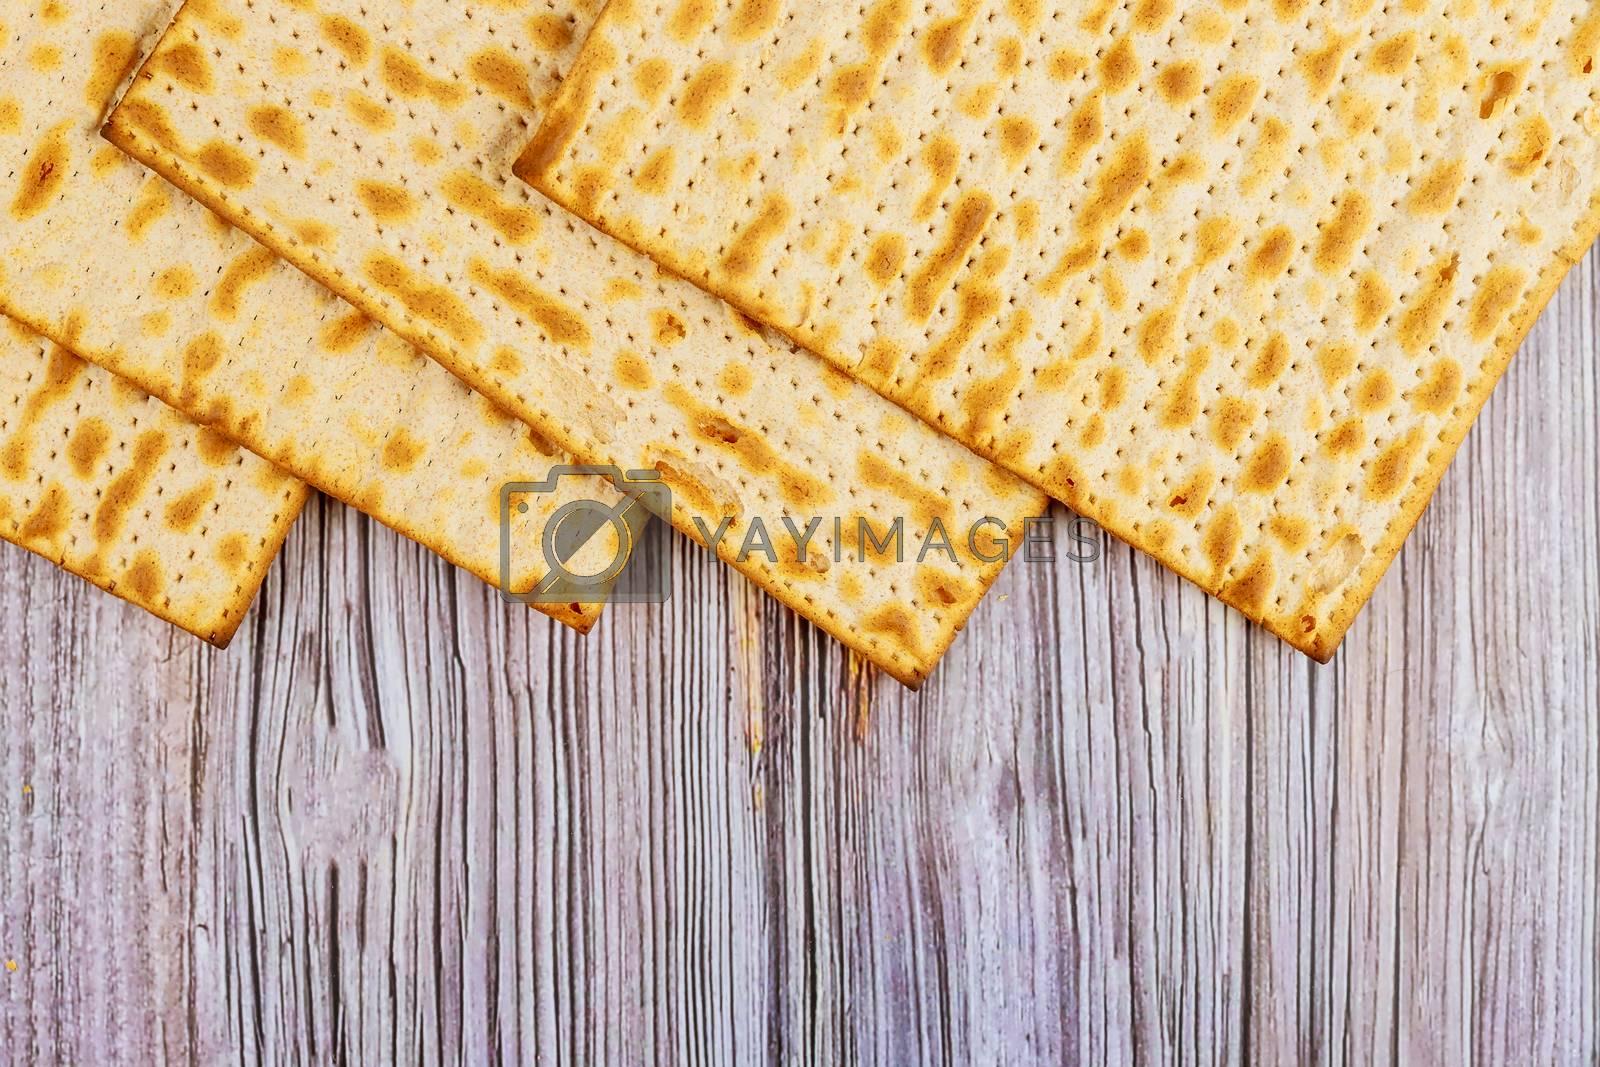 Jewish family celebrating passover matzoh jewish unleavened bread holiday